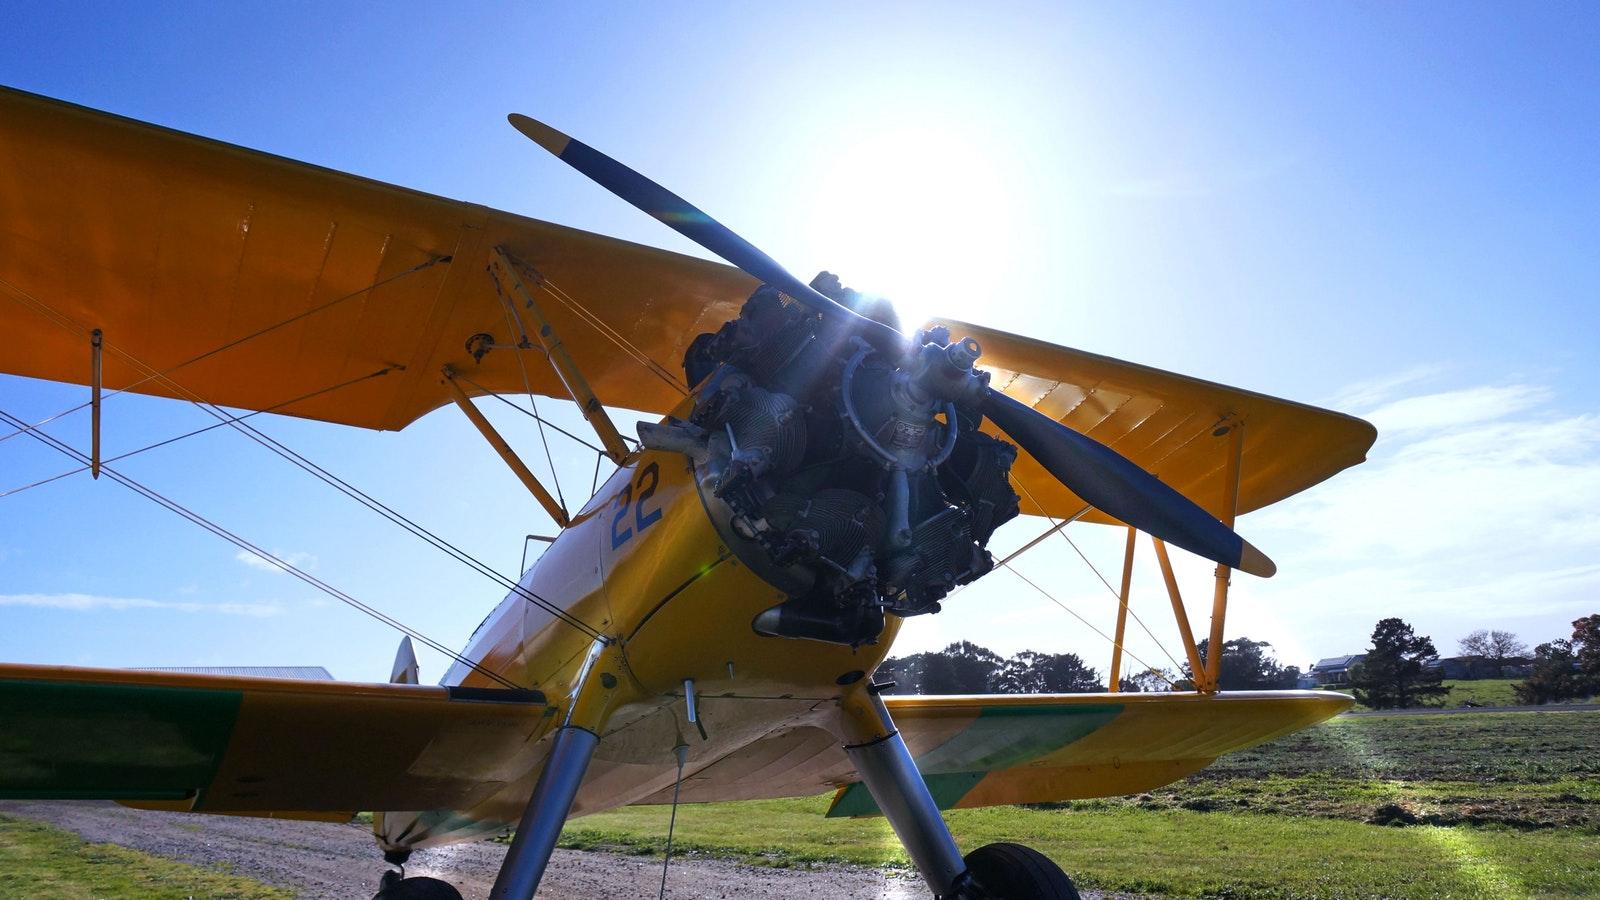 Tiger Moth World vintage biplane ready for takeoff